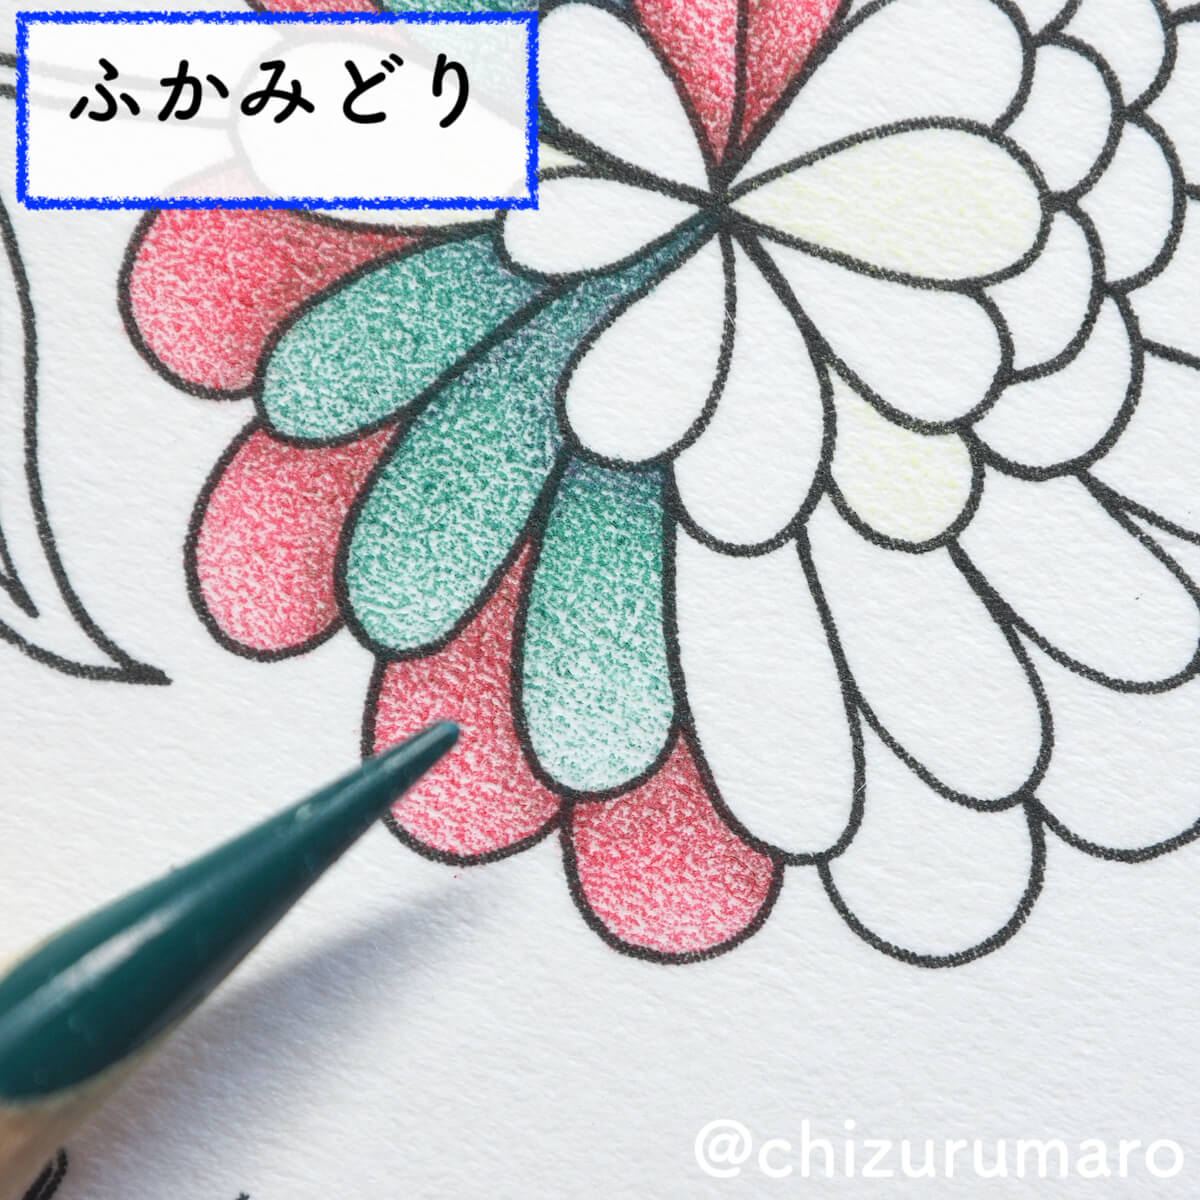 f:id:chizurumaro:20200511125003j:plain